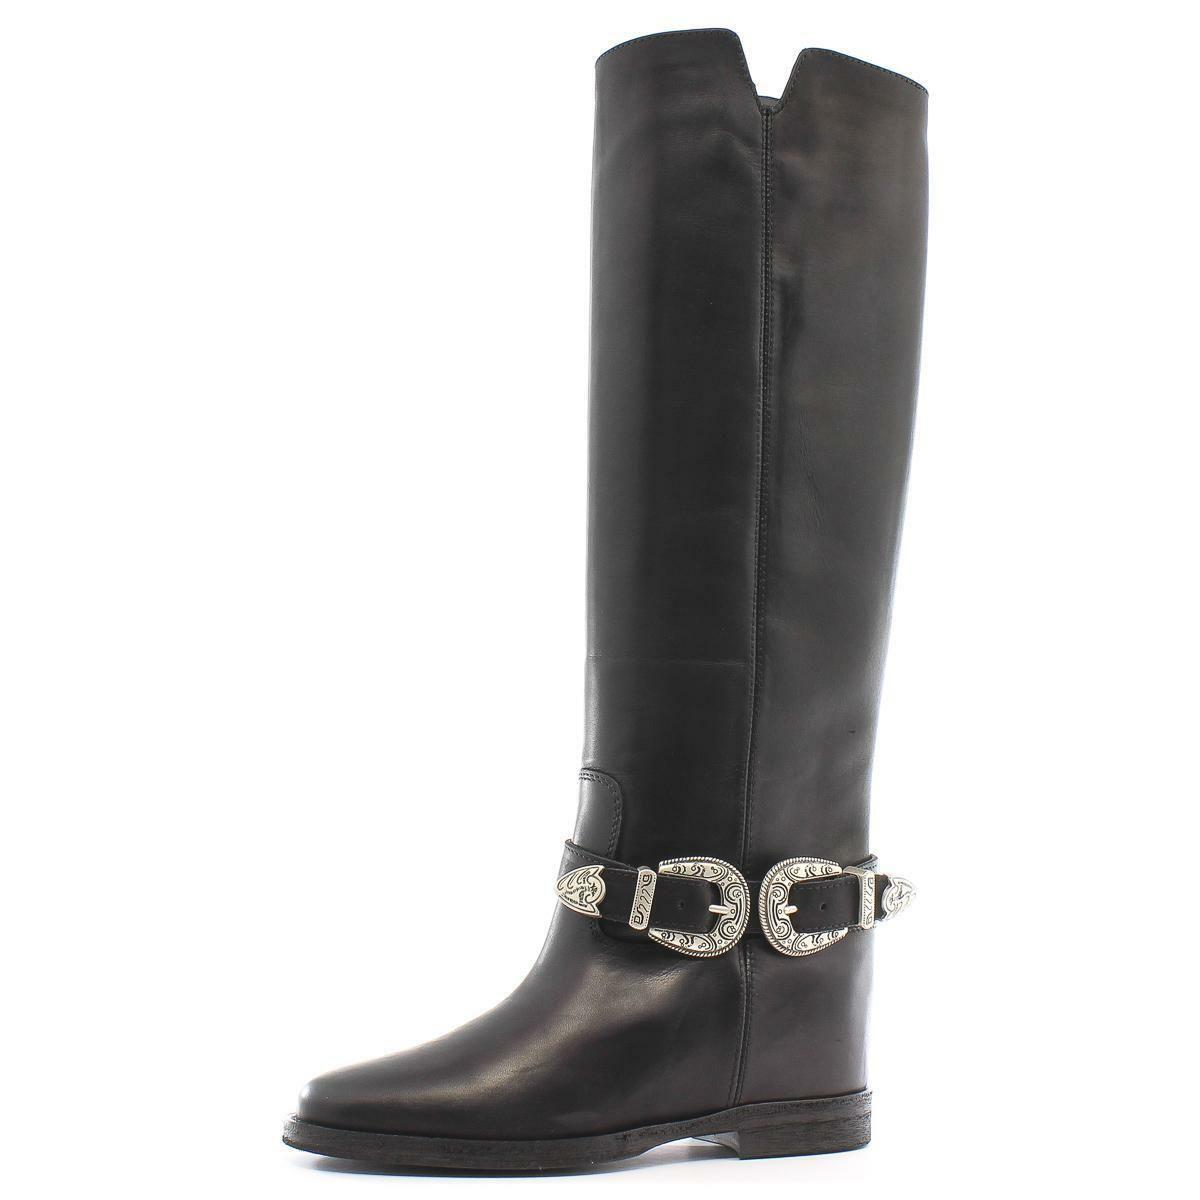 Dettagli su My Heels by Via Roma 15 Stivale 2454 Saint Barth